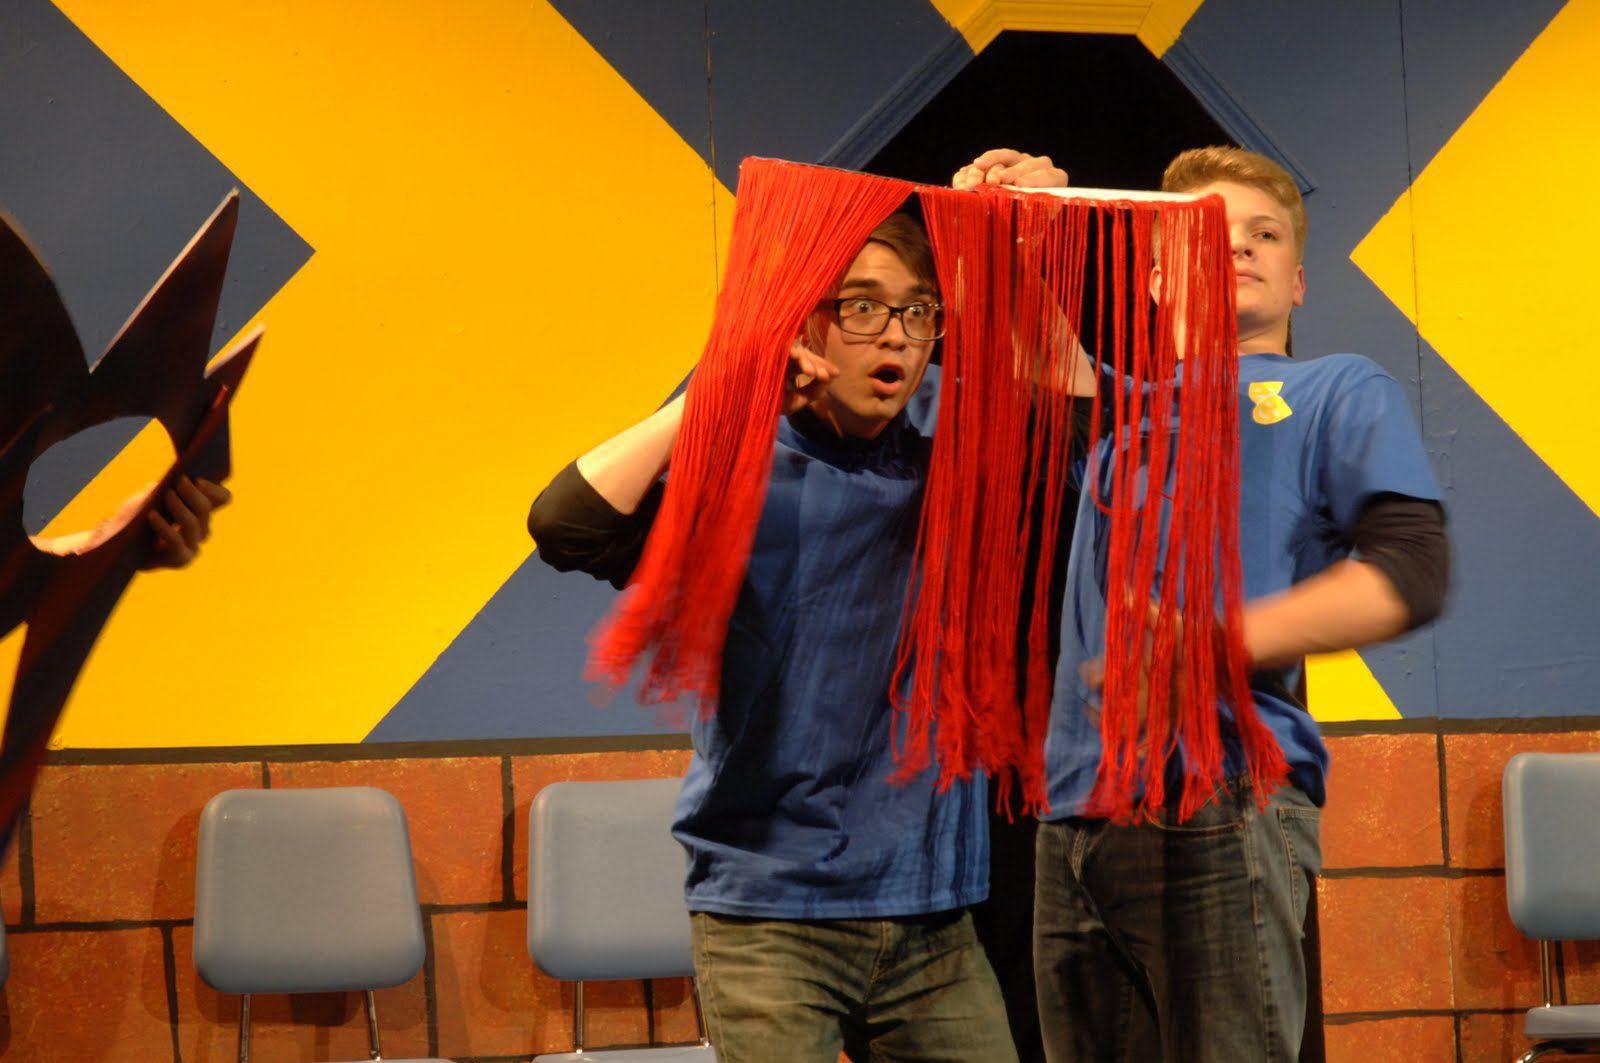 Caldwell students to host 'Cougamedy' improv show | Idaho Press